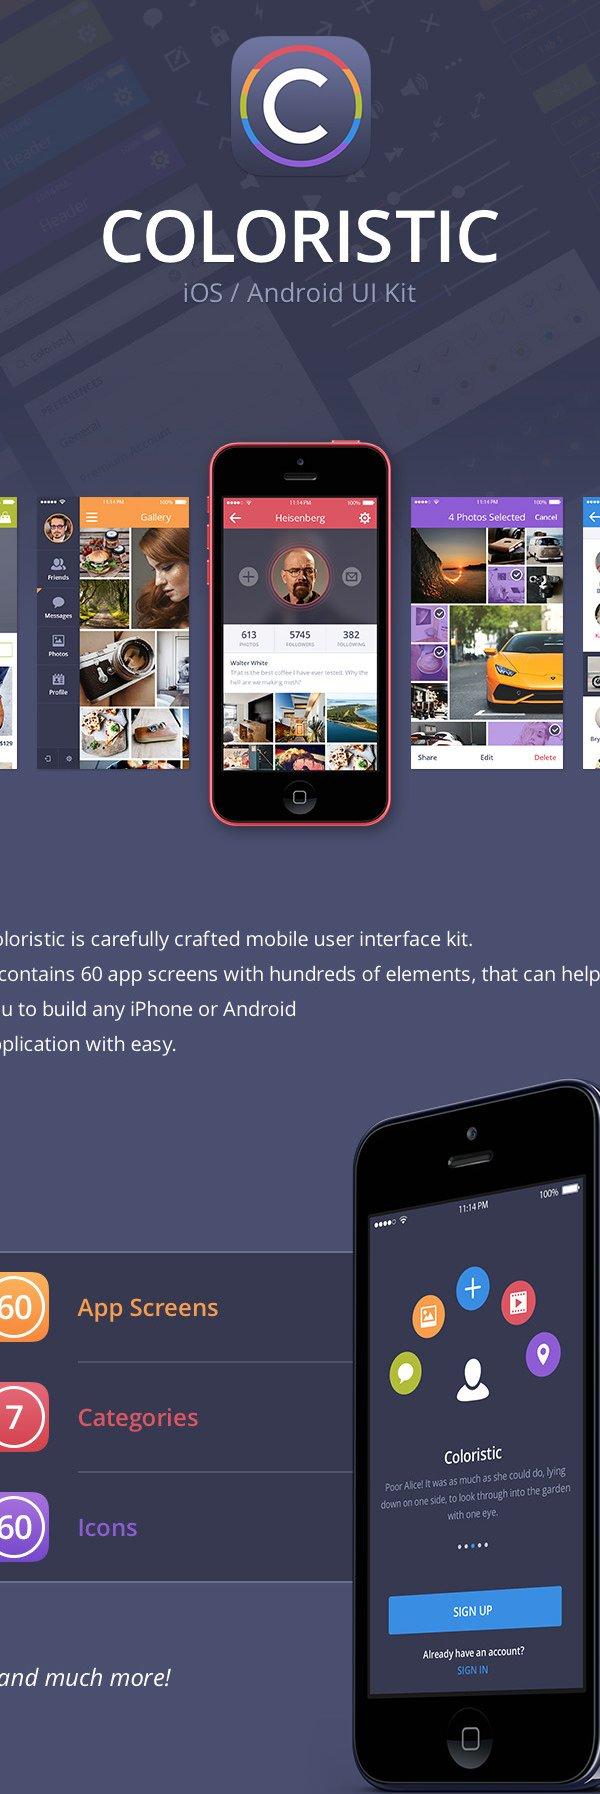 coloristic app ui kit